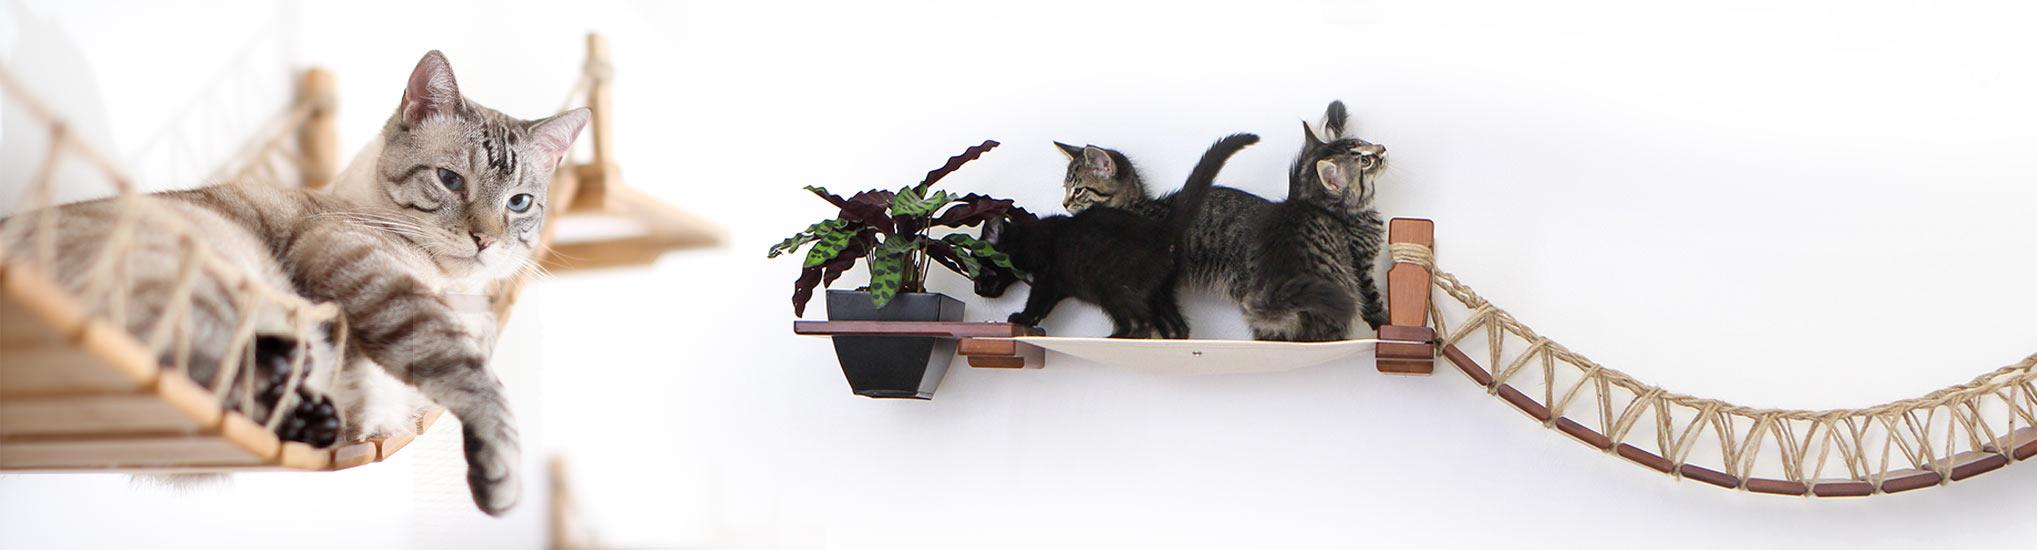 cats lounging on cat bridge